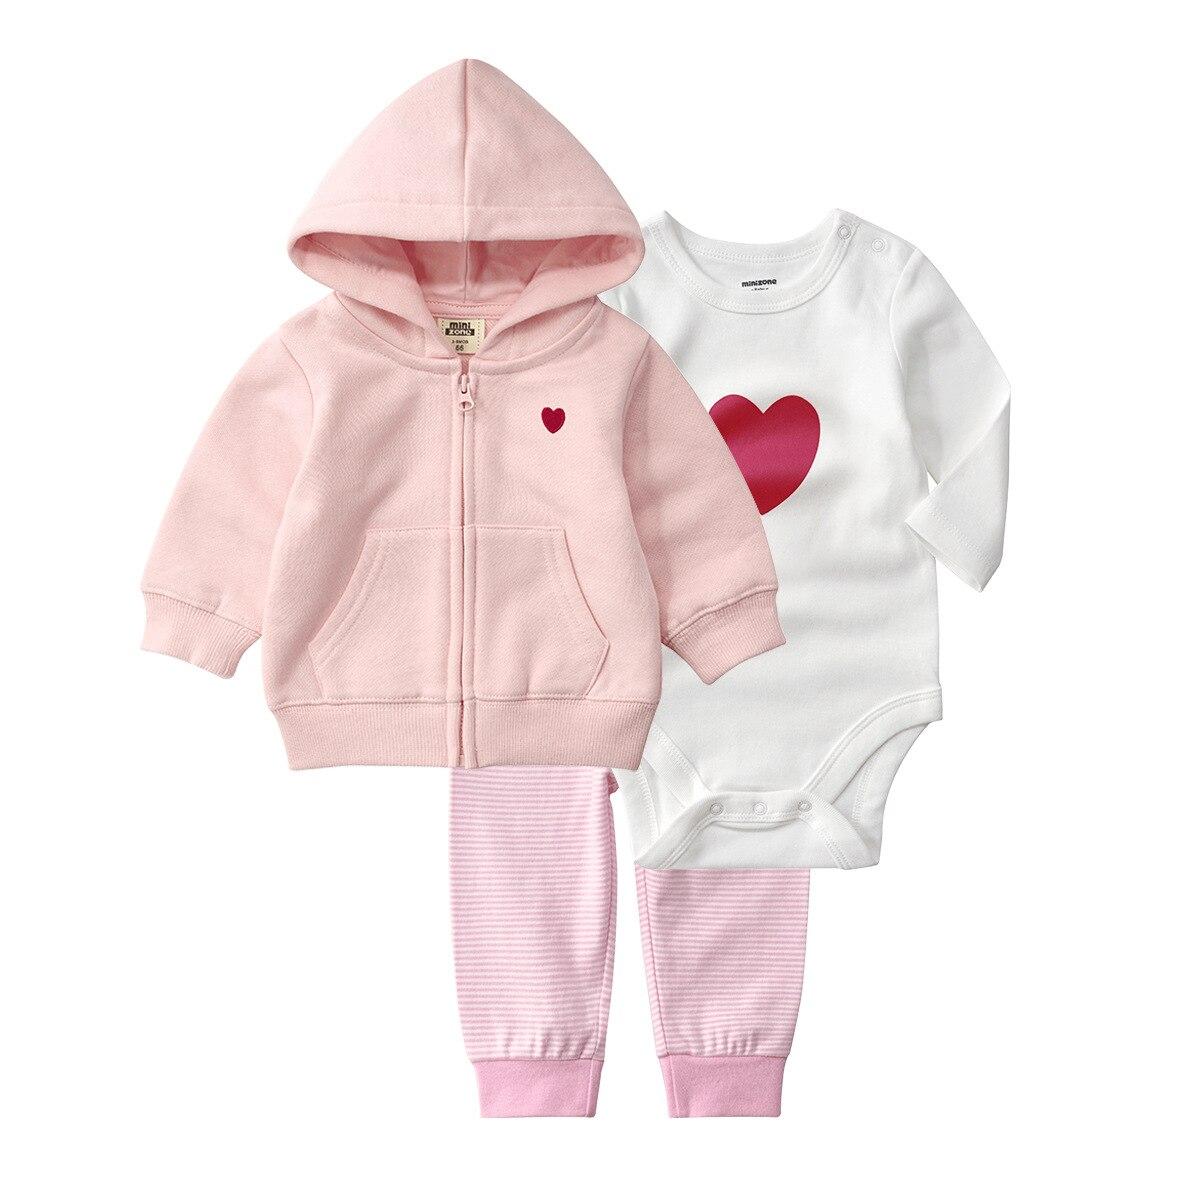 3pcs Hoodie+pants+bodysuits Children's Clothing Sets Autumn Boy Sports And Casuals Newborn baby clothes Soft Girls Cotton Sets